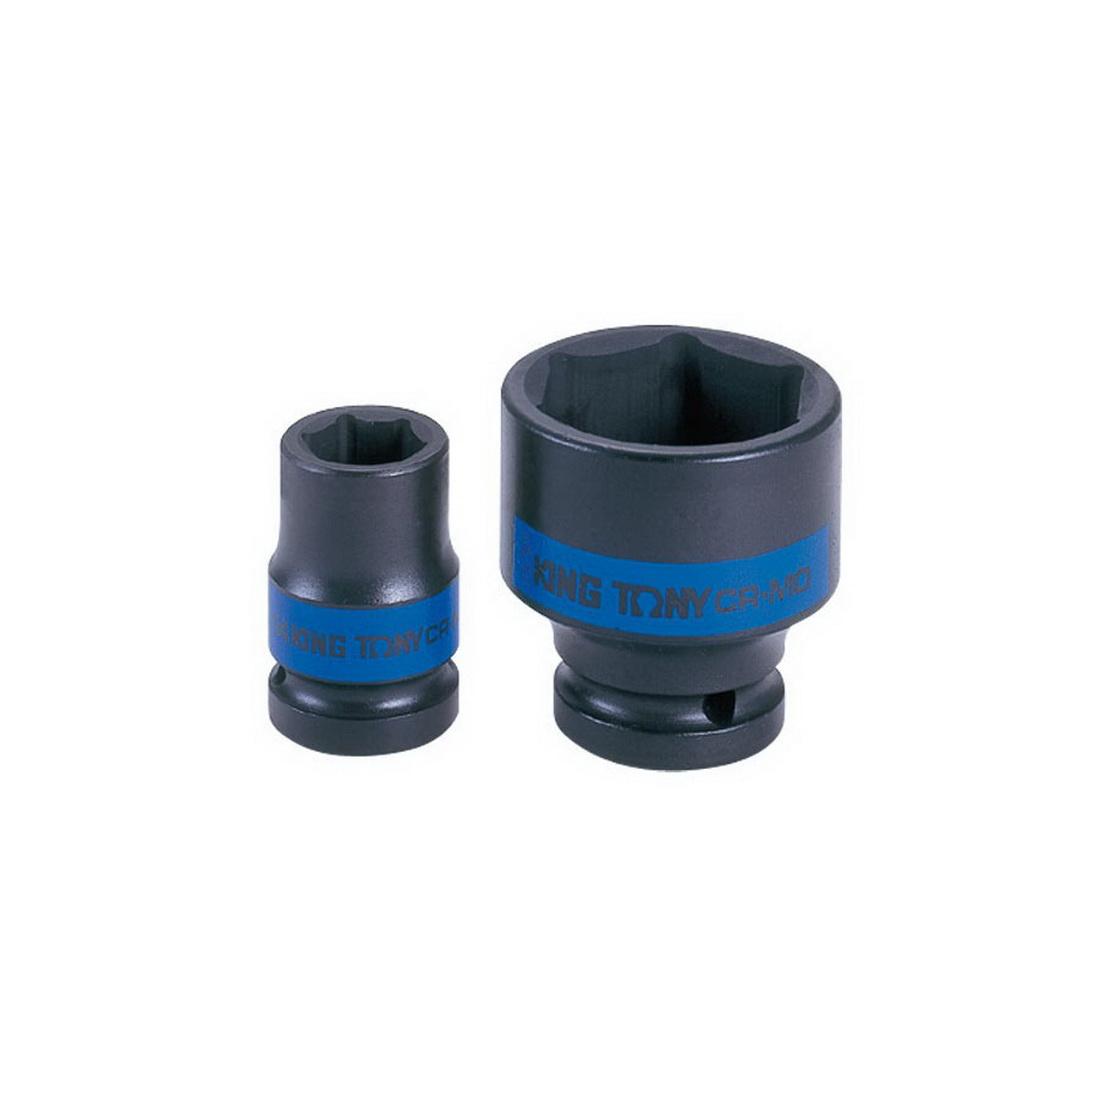 18mm 1/2 Inch Drive 6-Point Standard Impact Socket